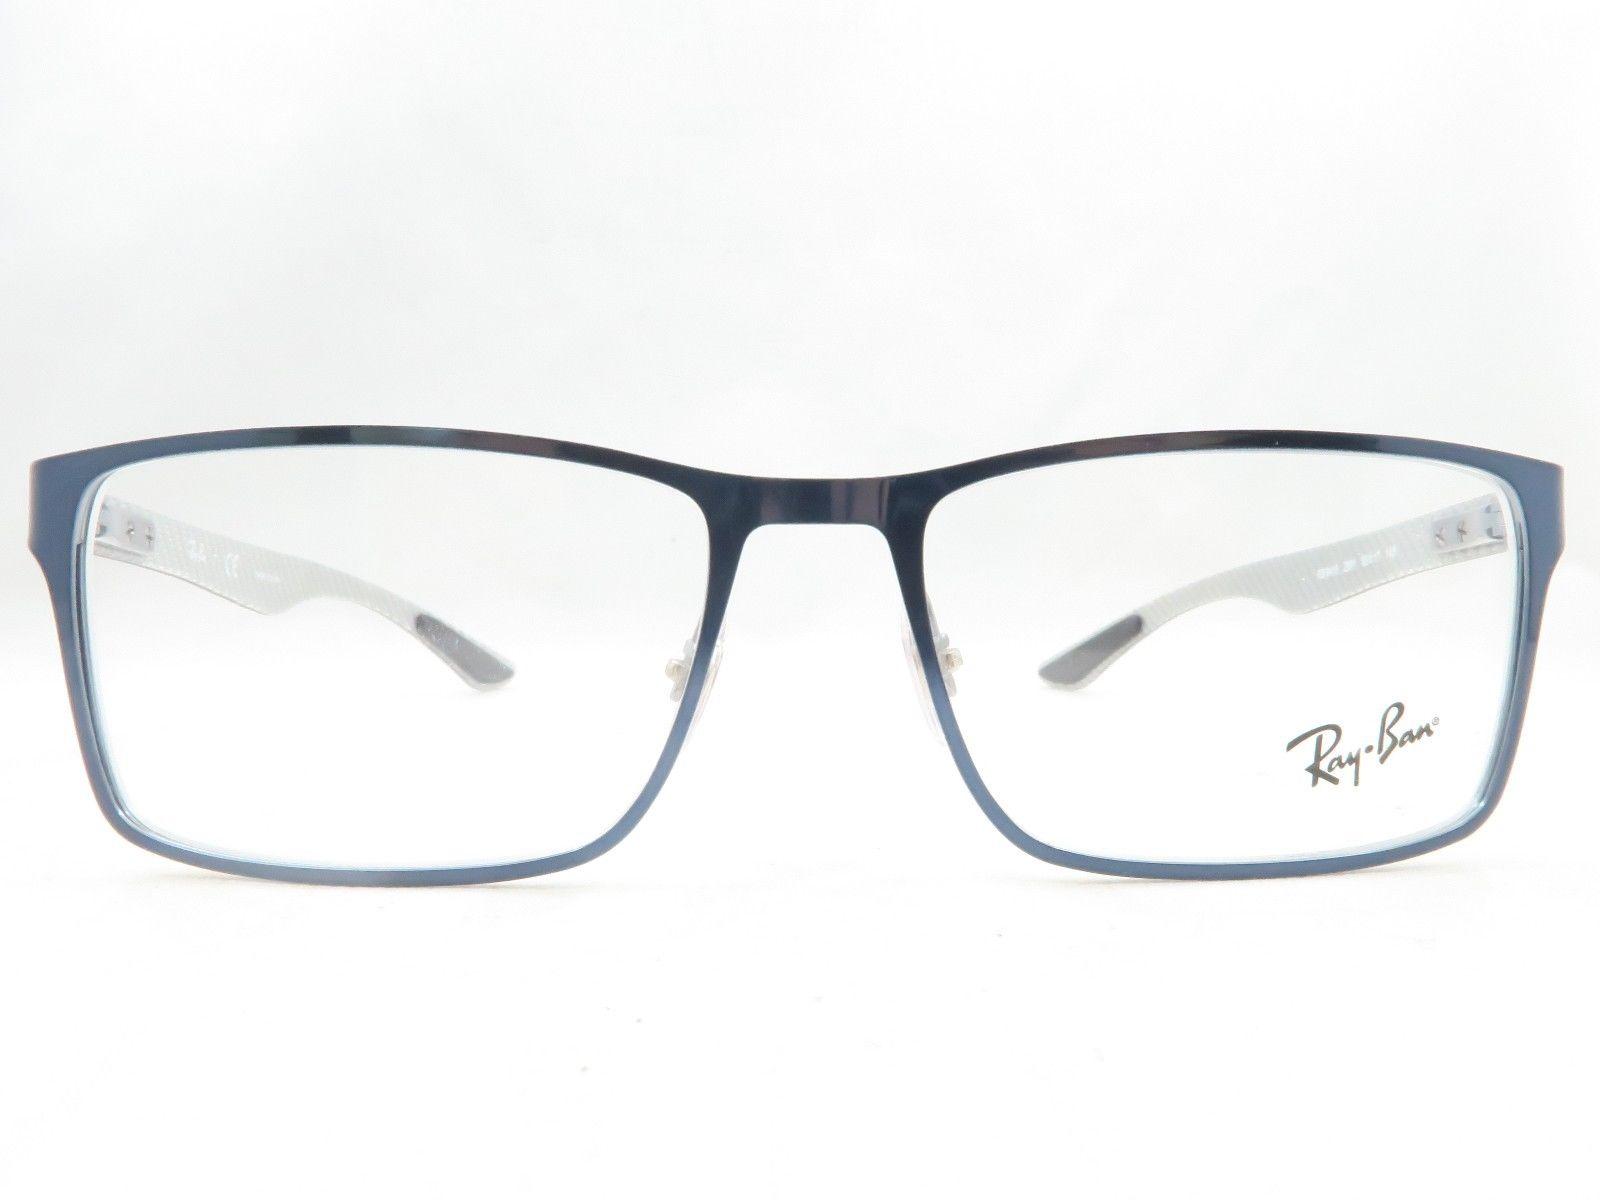 378a311da44 An image relevant to this listing An image relevant to this listing. Go  left Go right. Zoom. Ray Ban RB 8415 2881 Carbon Fiber Frames Eyeglasses  55mm - 57